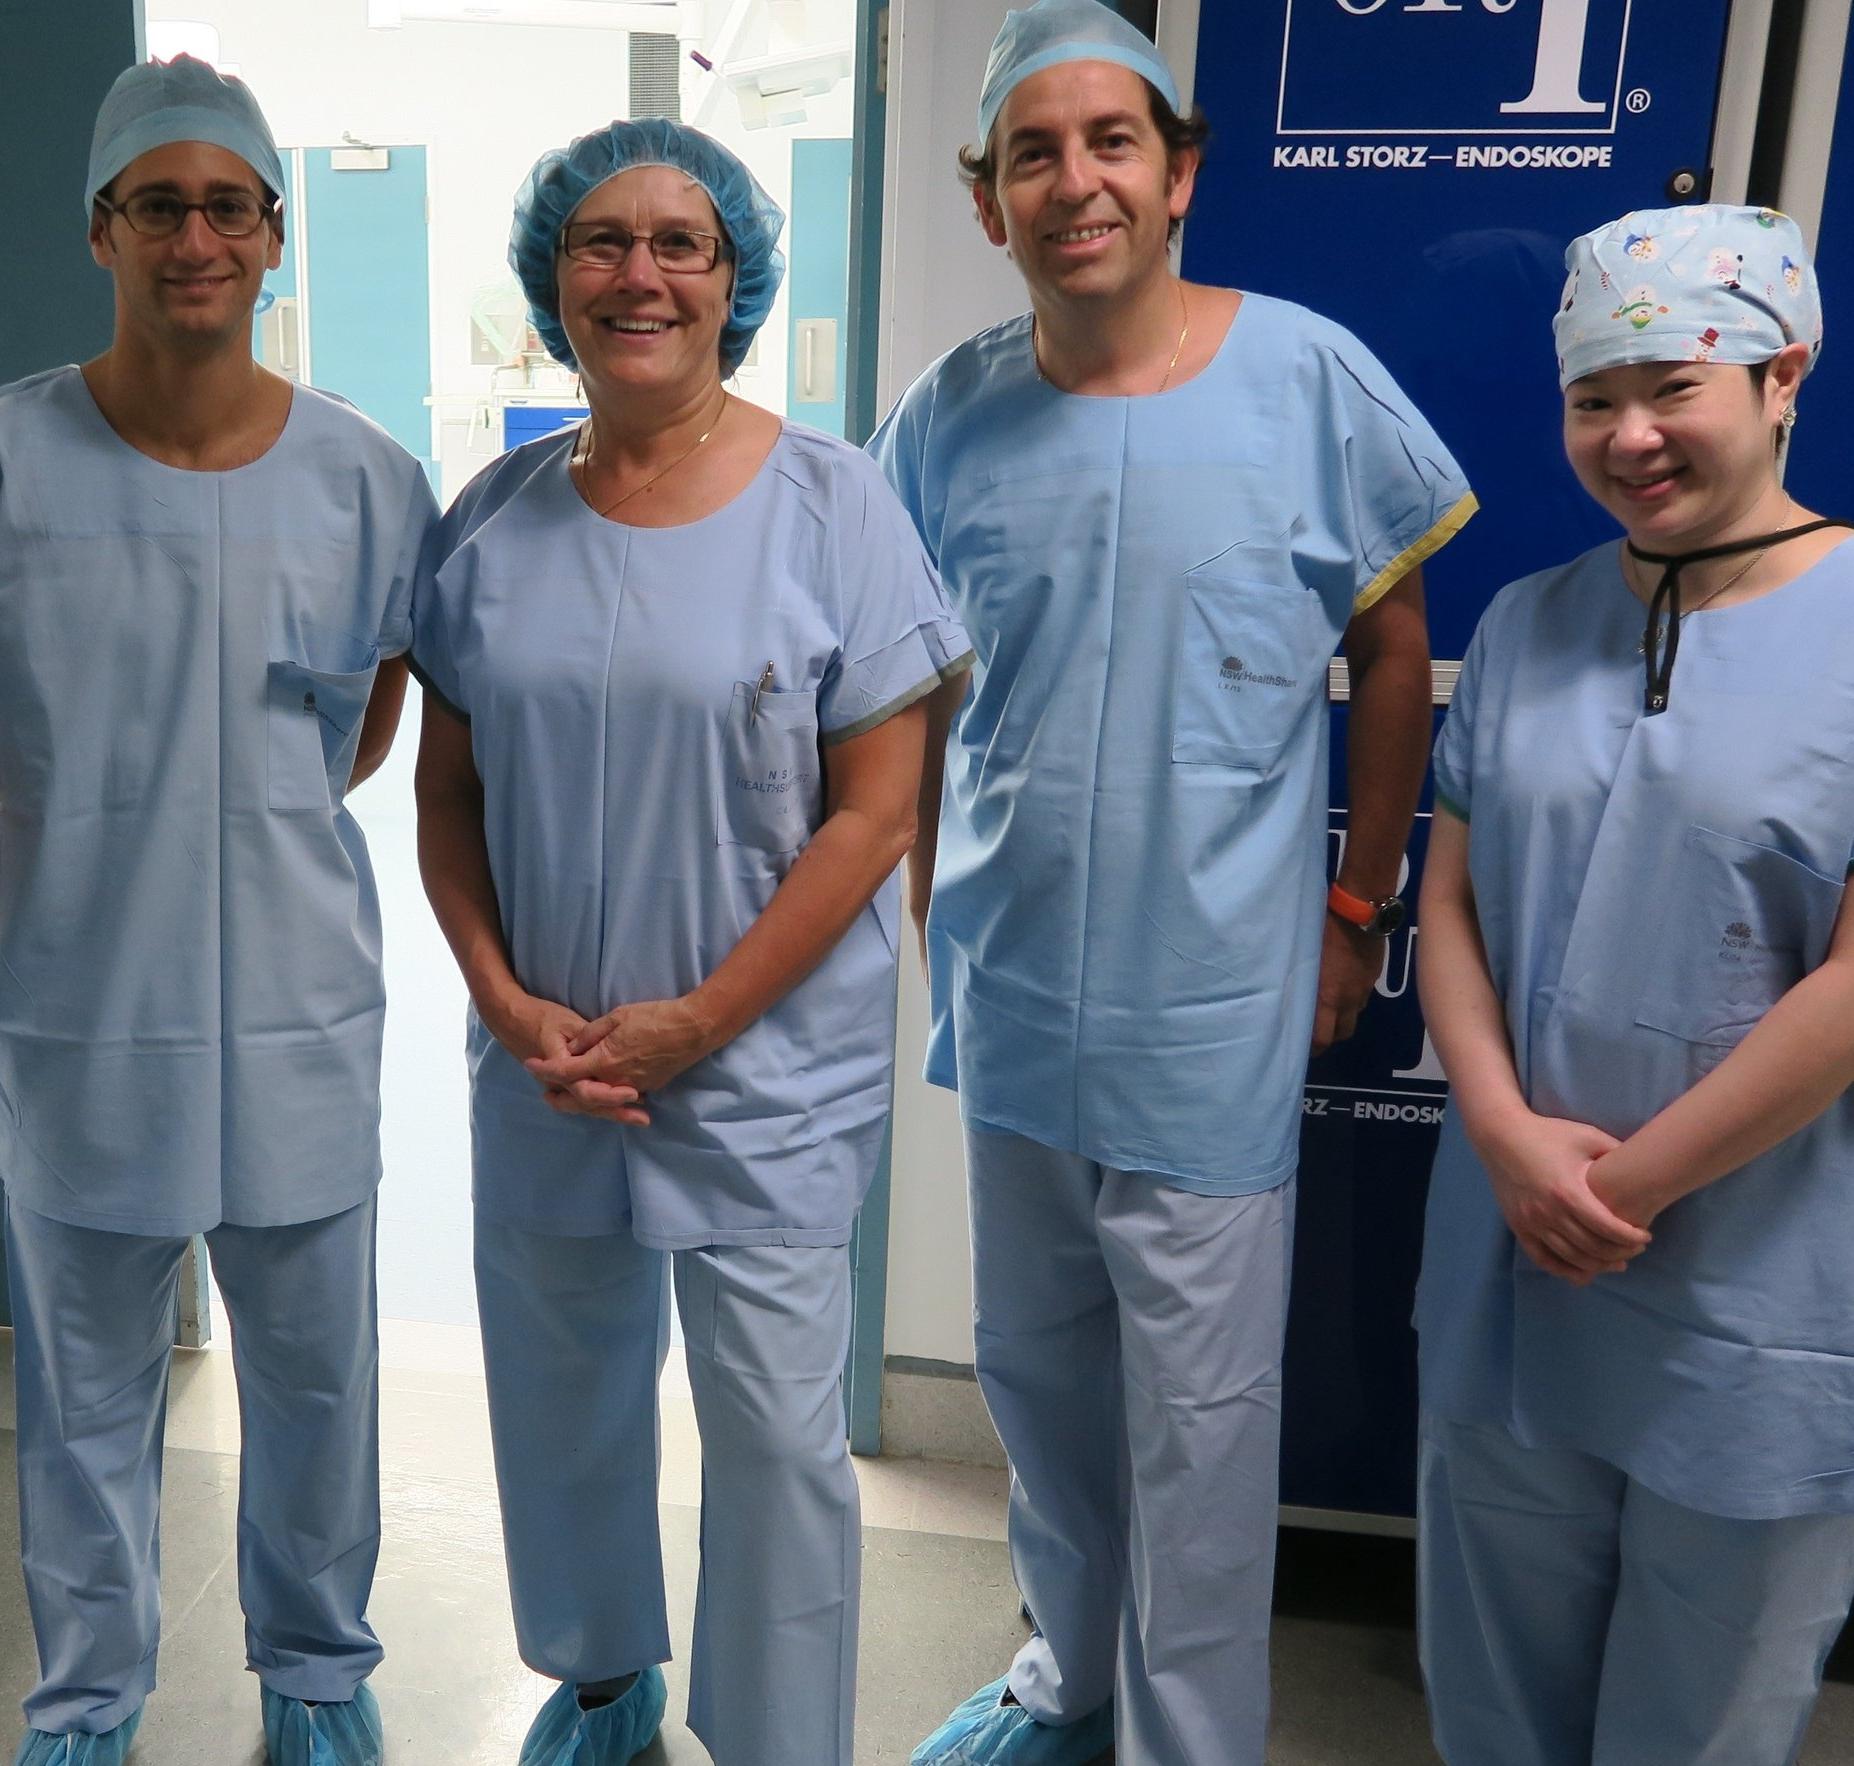 Drs Jonathan Bellity (Hand Surgery Fellow,France), Monica Wiig (Visiting Professor, Sweden), Alejandro Bifani (Visiting Professor, Chile), and Sharon Chu (Hand Surgery PFET Fellow,Australia)